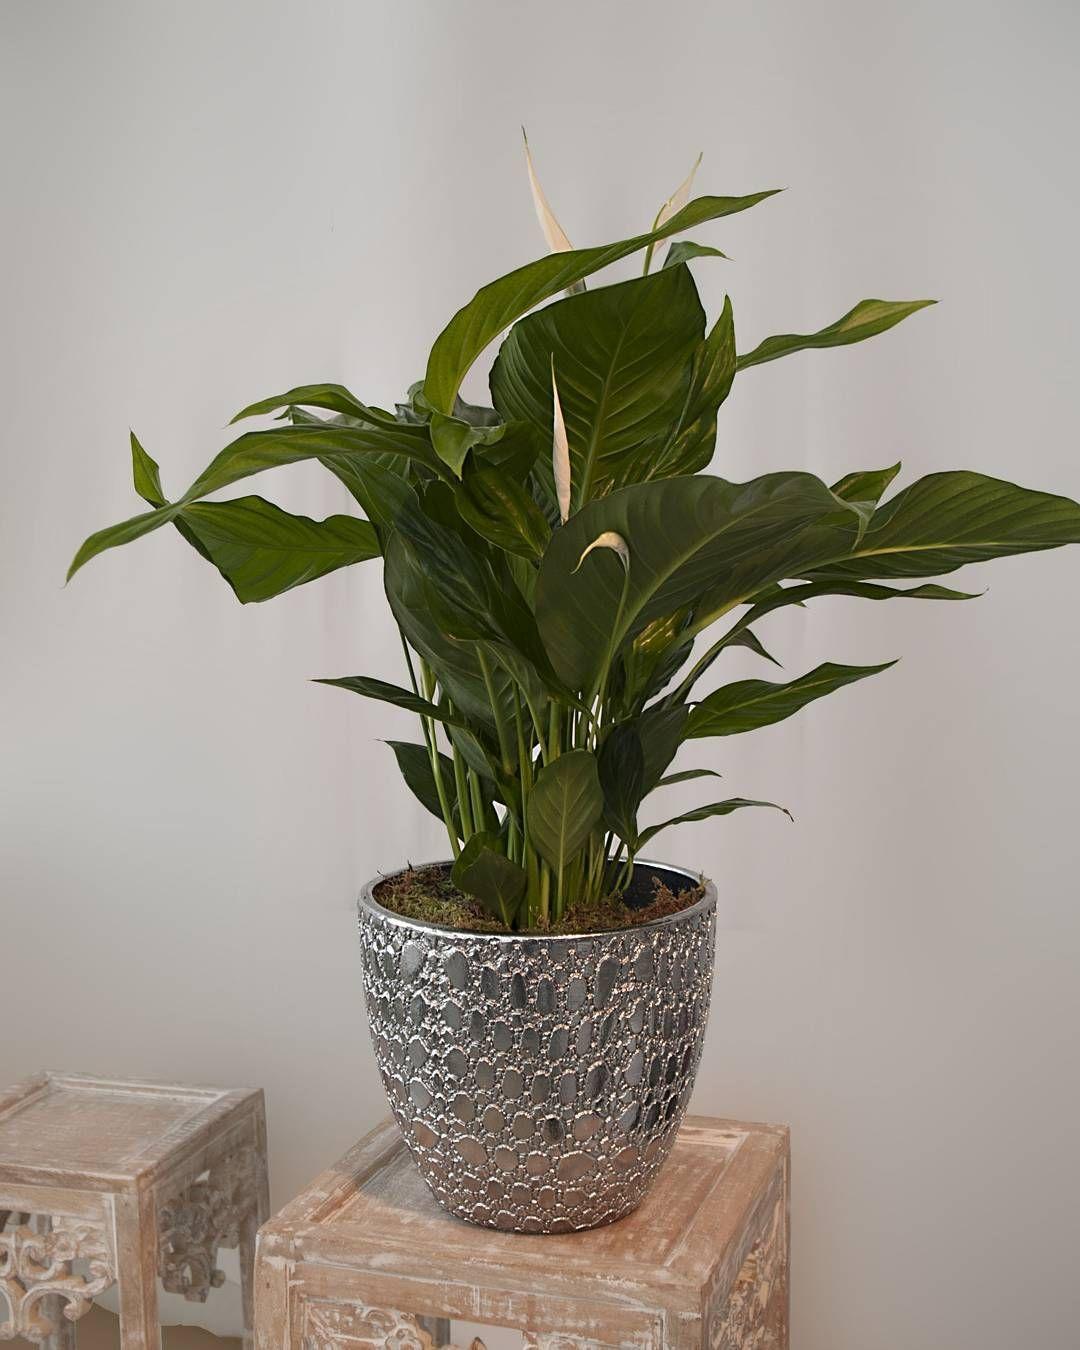 maceta par s cer mica paris pot ceramics decoracion decor home homeandgarden florist. Black Bedroom Furniture Sets. Home Design Ideas